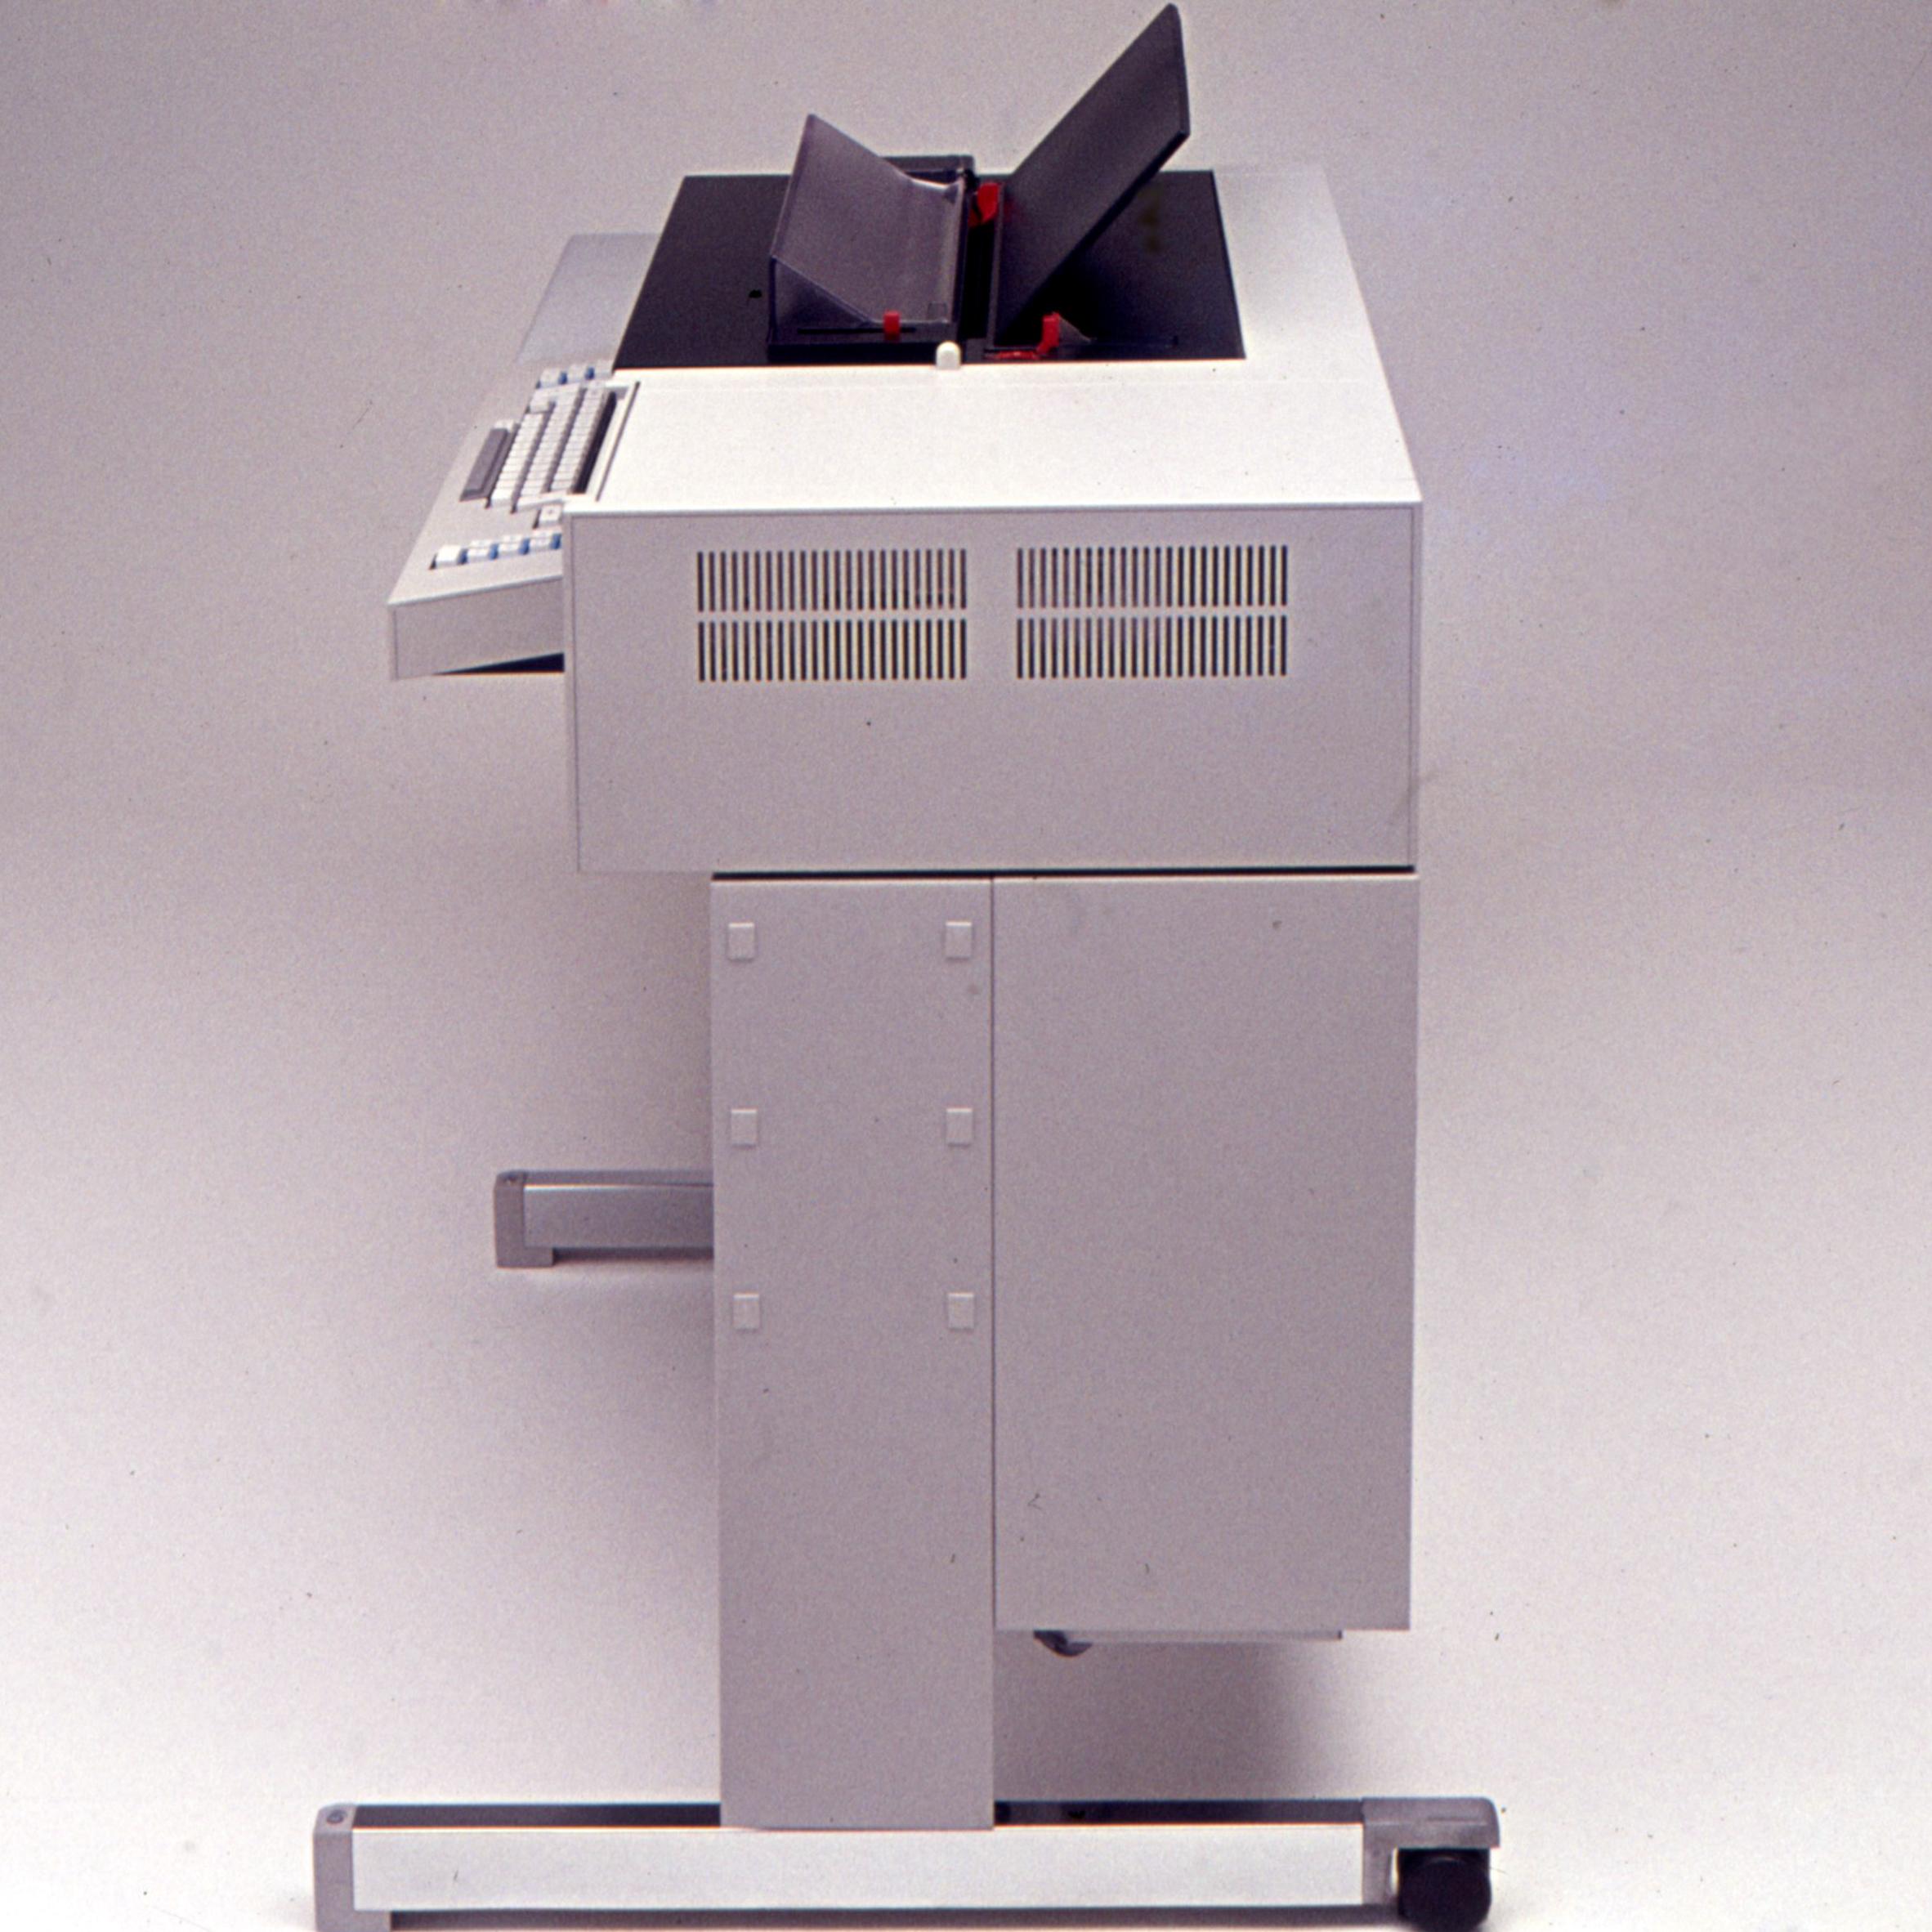 - Olivetti_Calculators1970_Photos(11).jpg